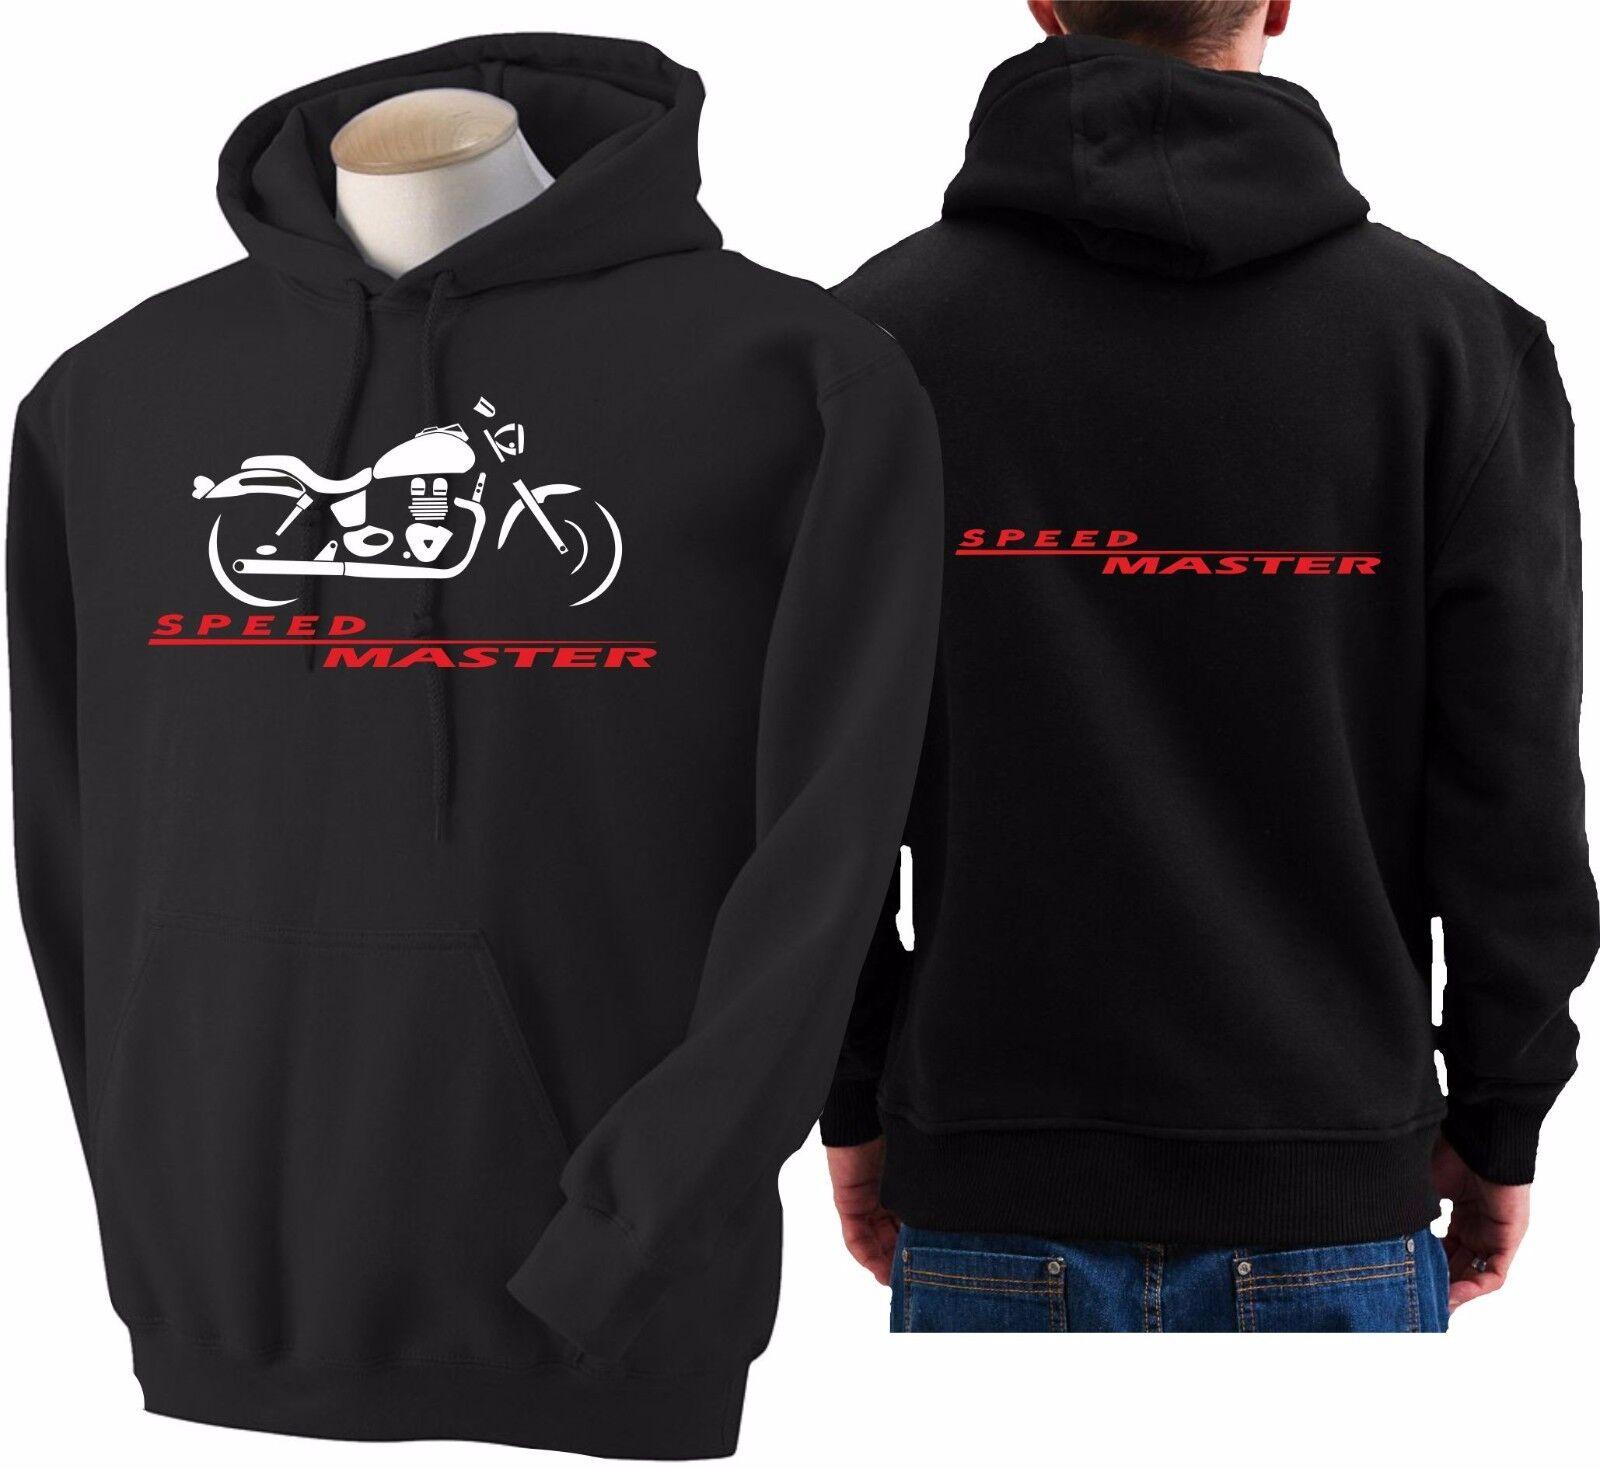 Hoodie for bike TRIUMPH SPEED MASTER sweatshirt hoody Sudadera moto speedmaster